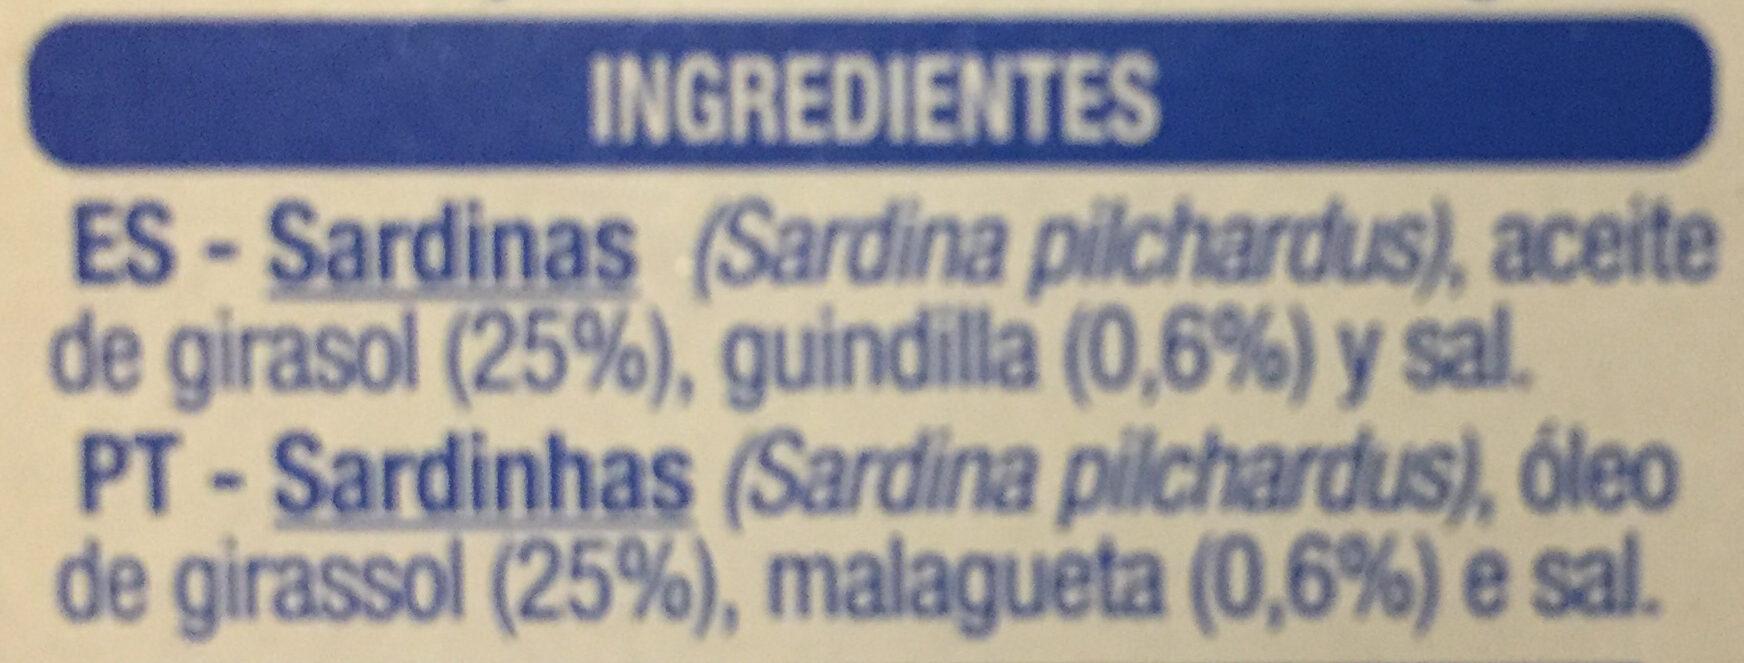 Sardinillas picantes en aceite de girasol - Ingrediënten - es